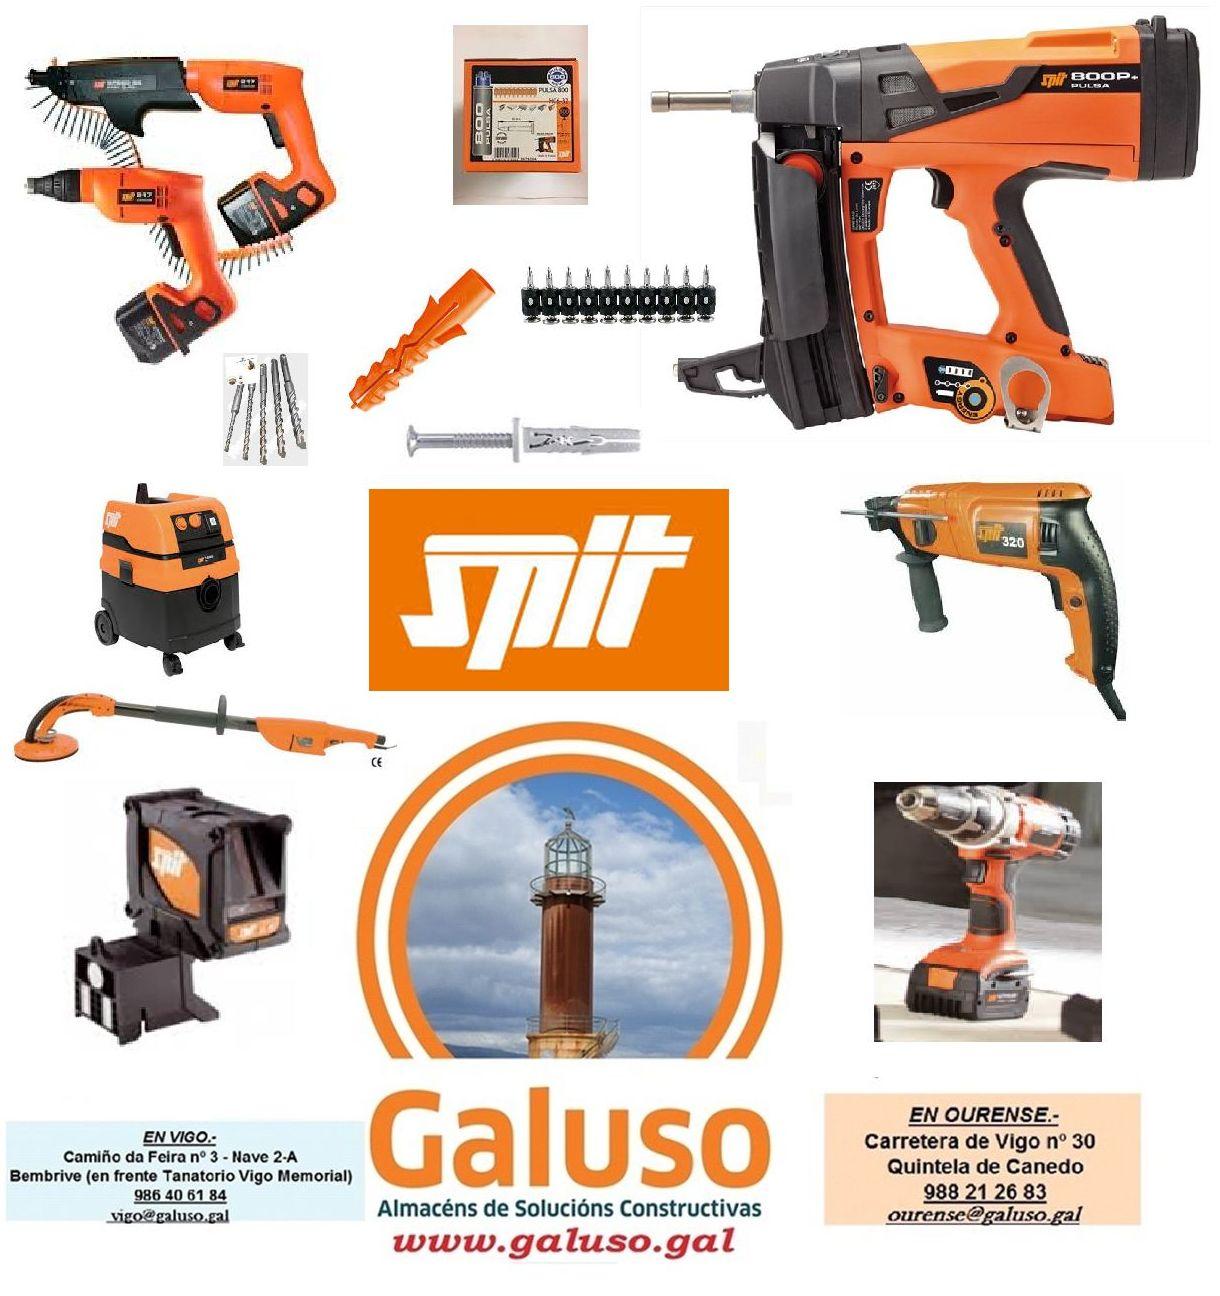 SPIT 2019-2: Catálogo de Galuso